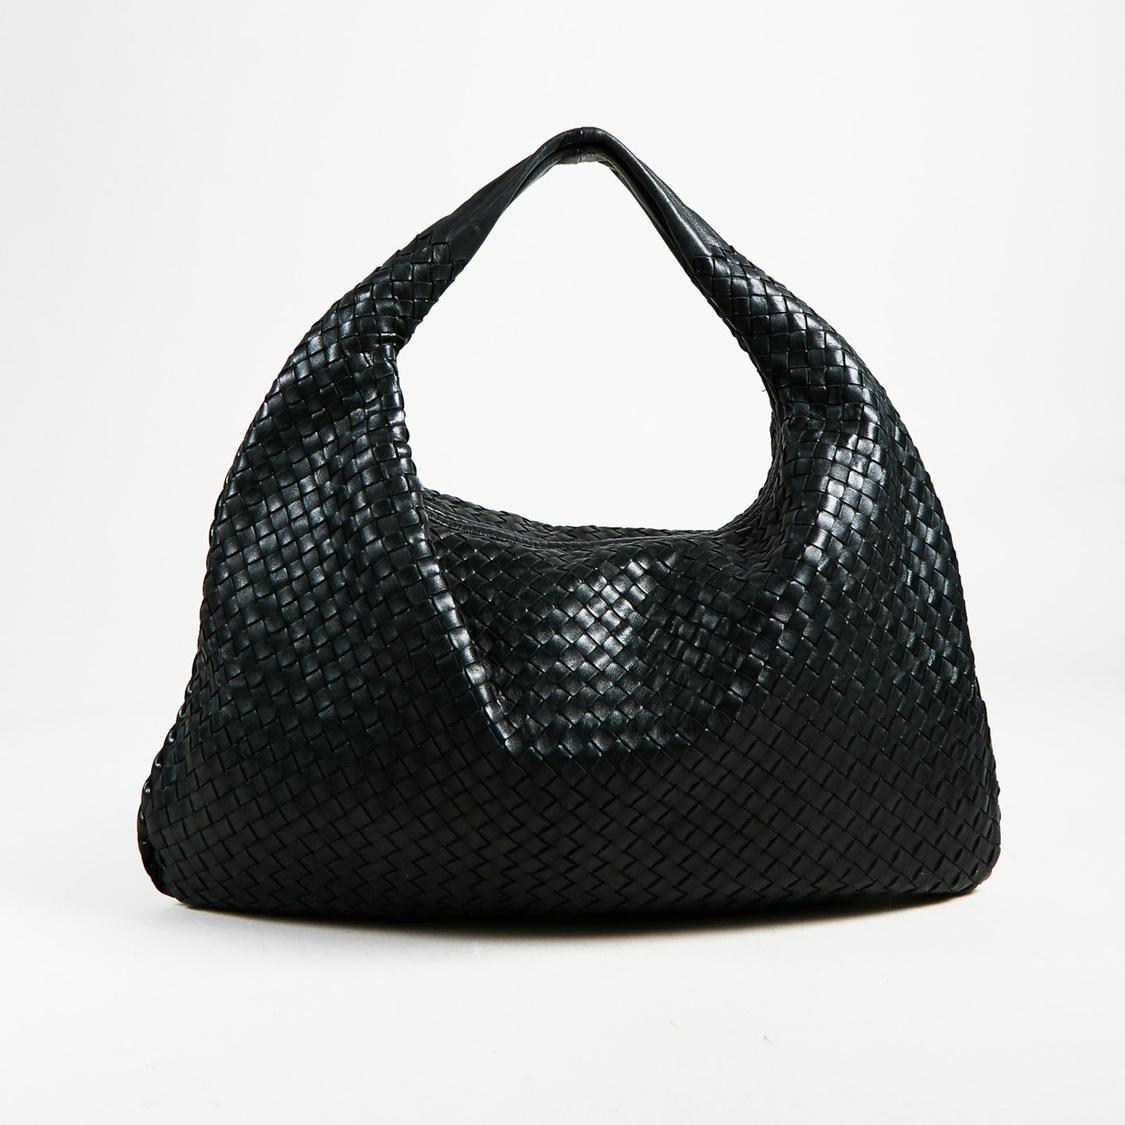 301fced2d4 Lyst - Bottega Veneta Black